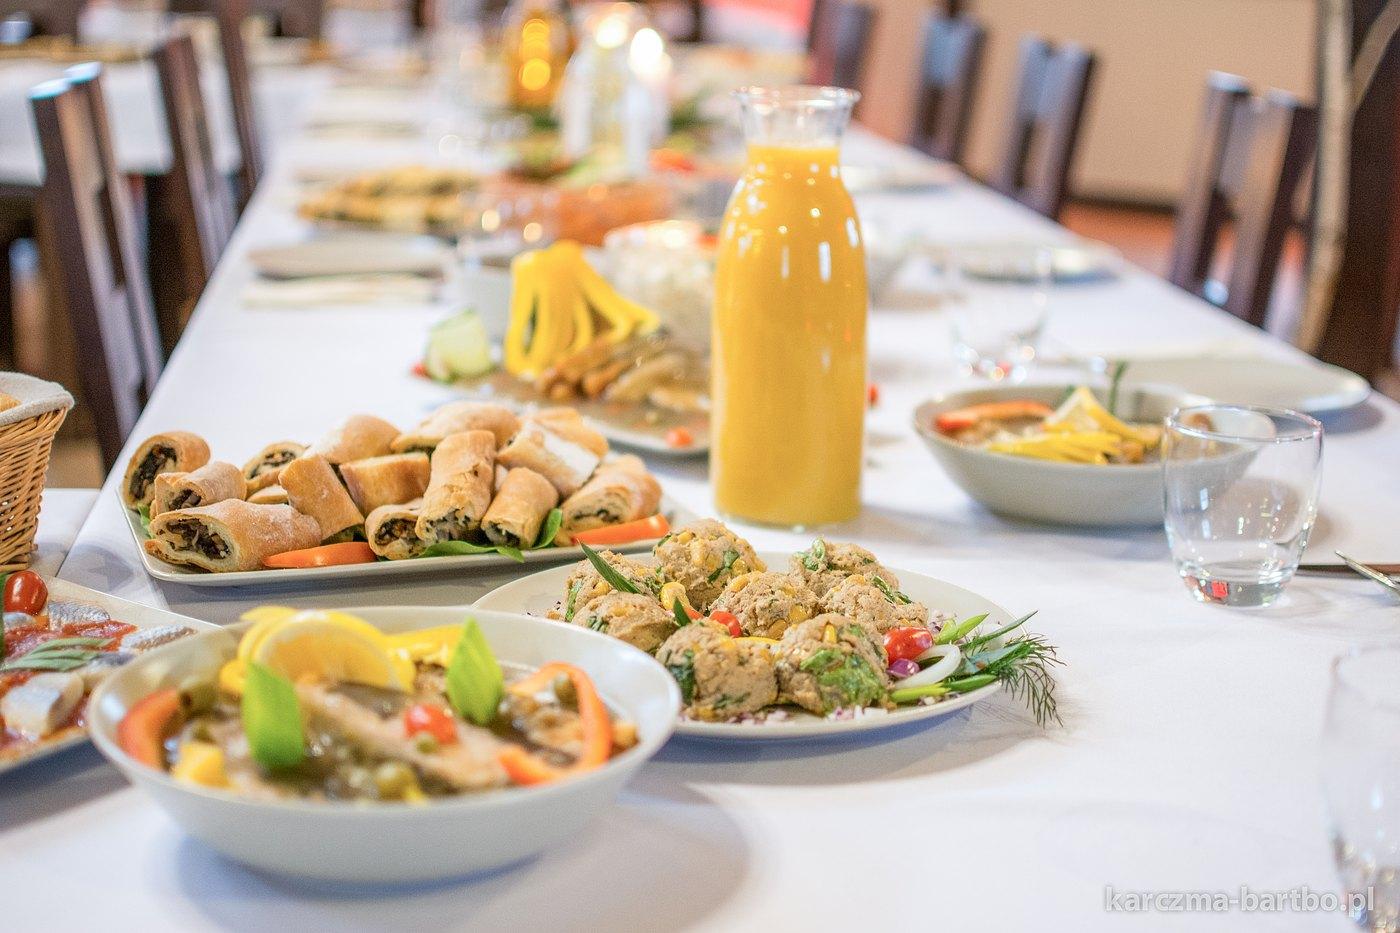 Catering - Karczma Bartbo